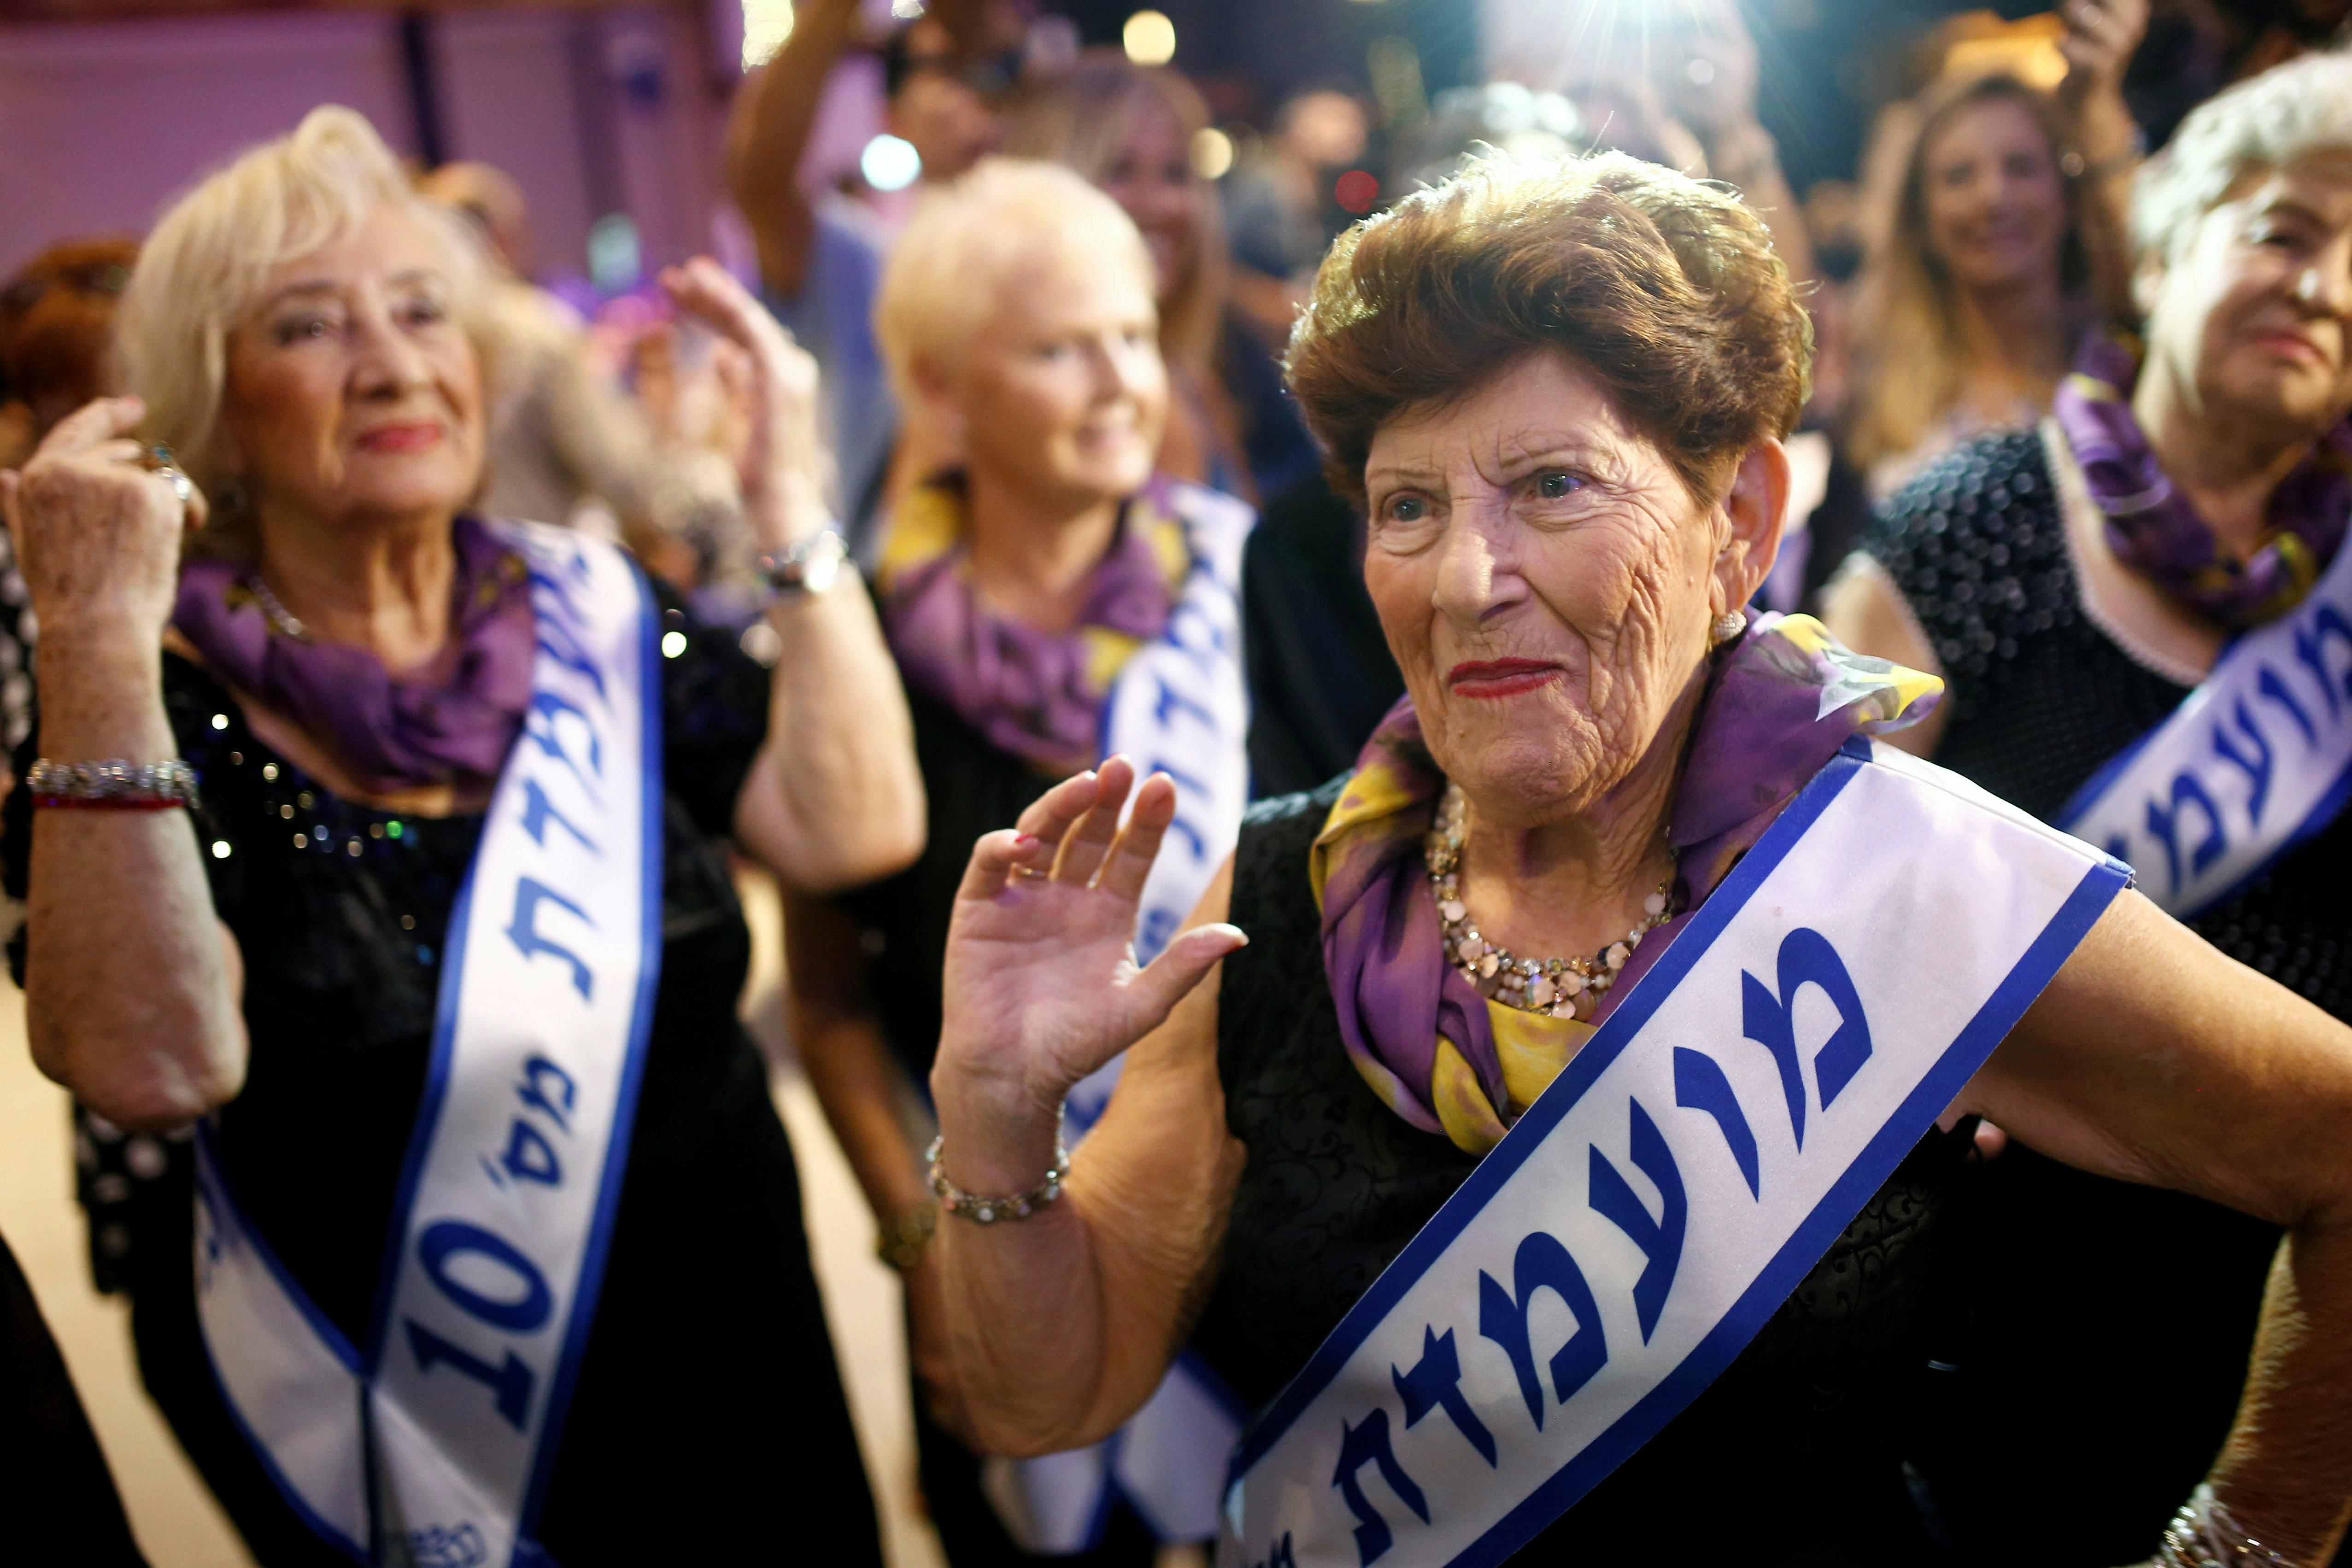 Holocaust survivor, Carmela Ben Yehuda, 89, dances during the annual Holocaust survivors' beauty pageant in the Israeli city